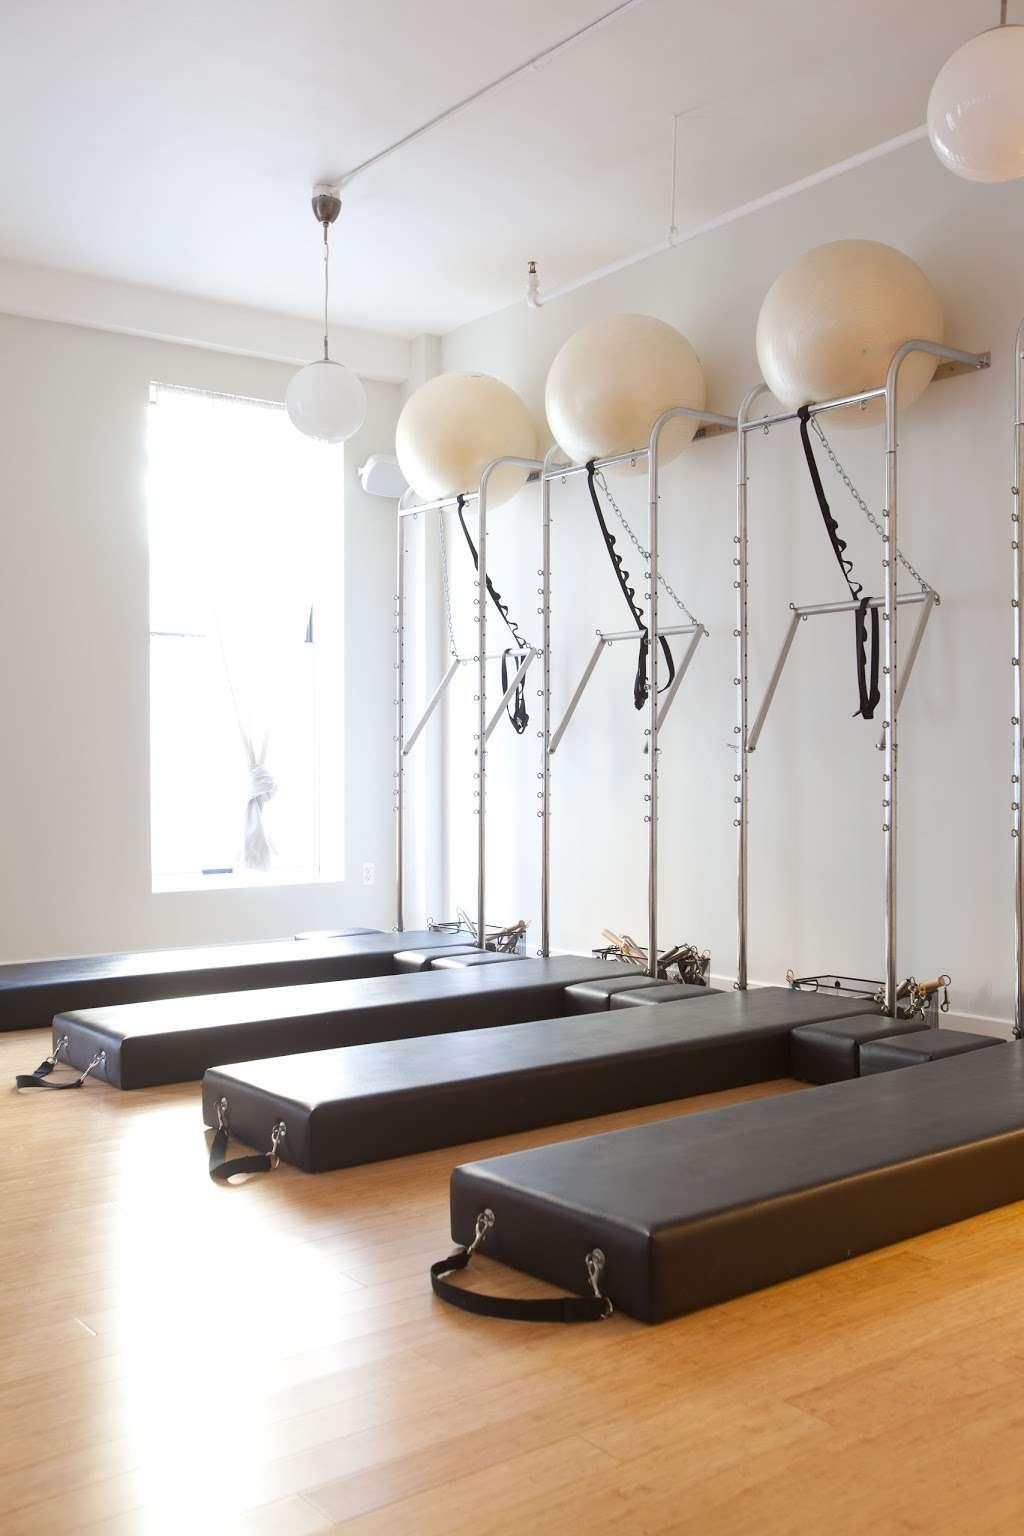 Hamilton Health & Fitness - gym  | Photo 8 of 10 | Address: 161 Erie St, Jersey City, NJ 07302, USA | Phone: (201) 714-7600